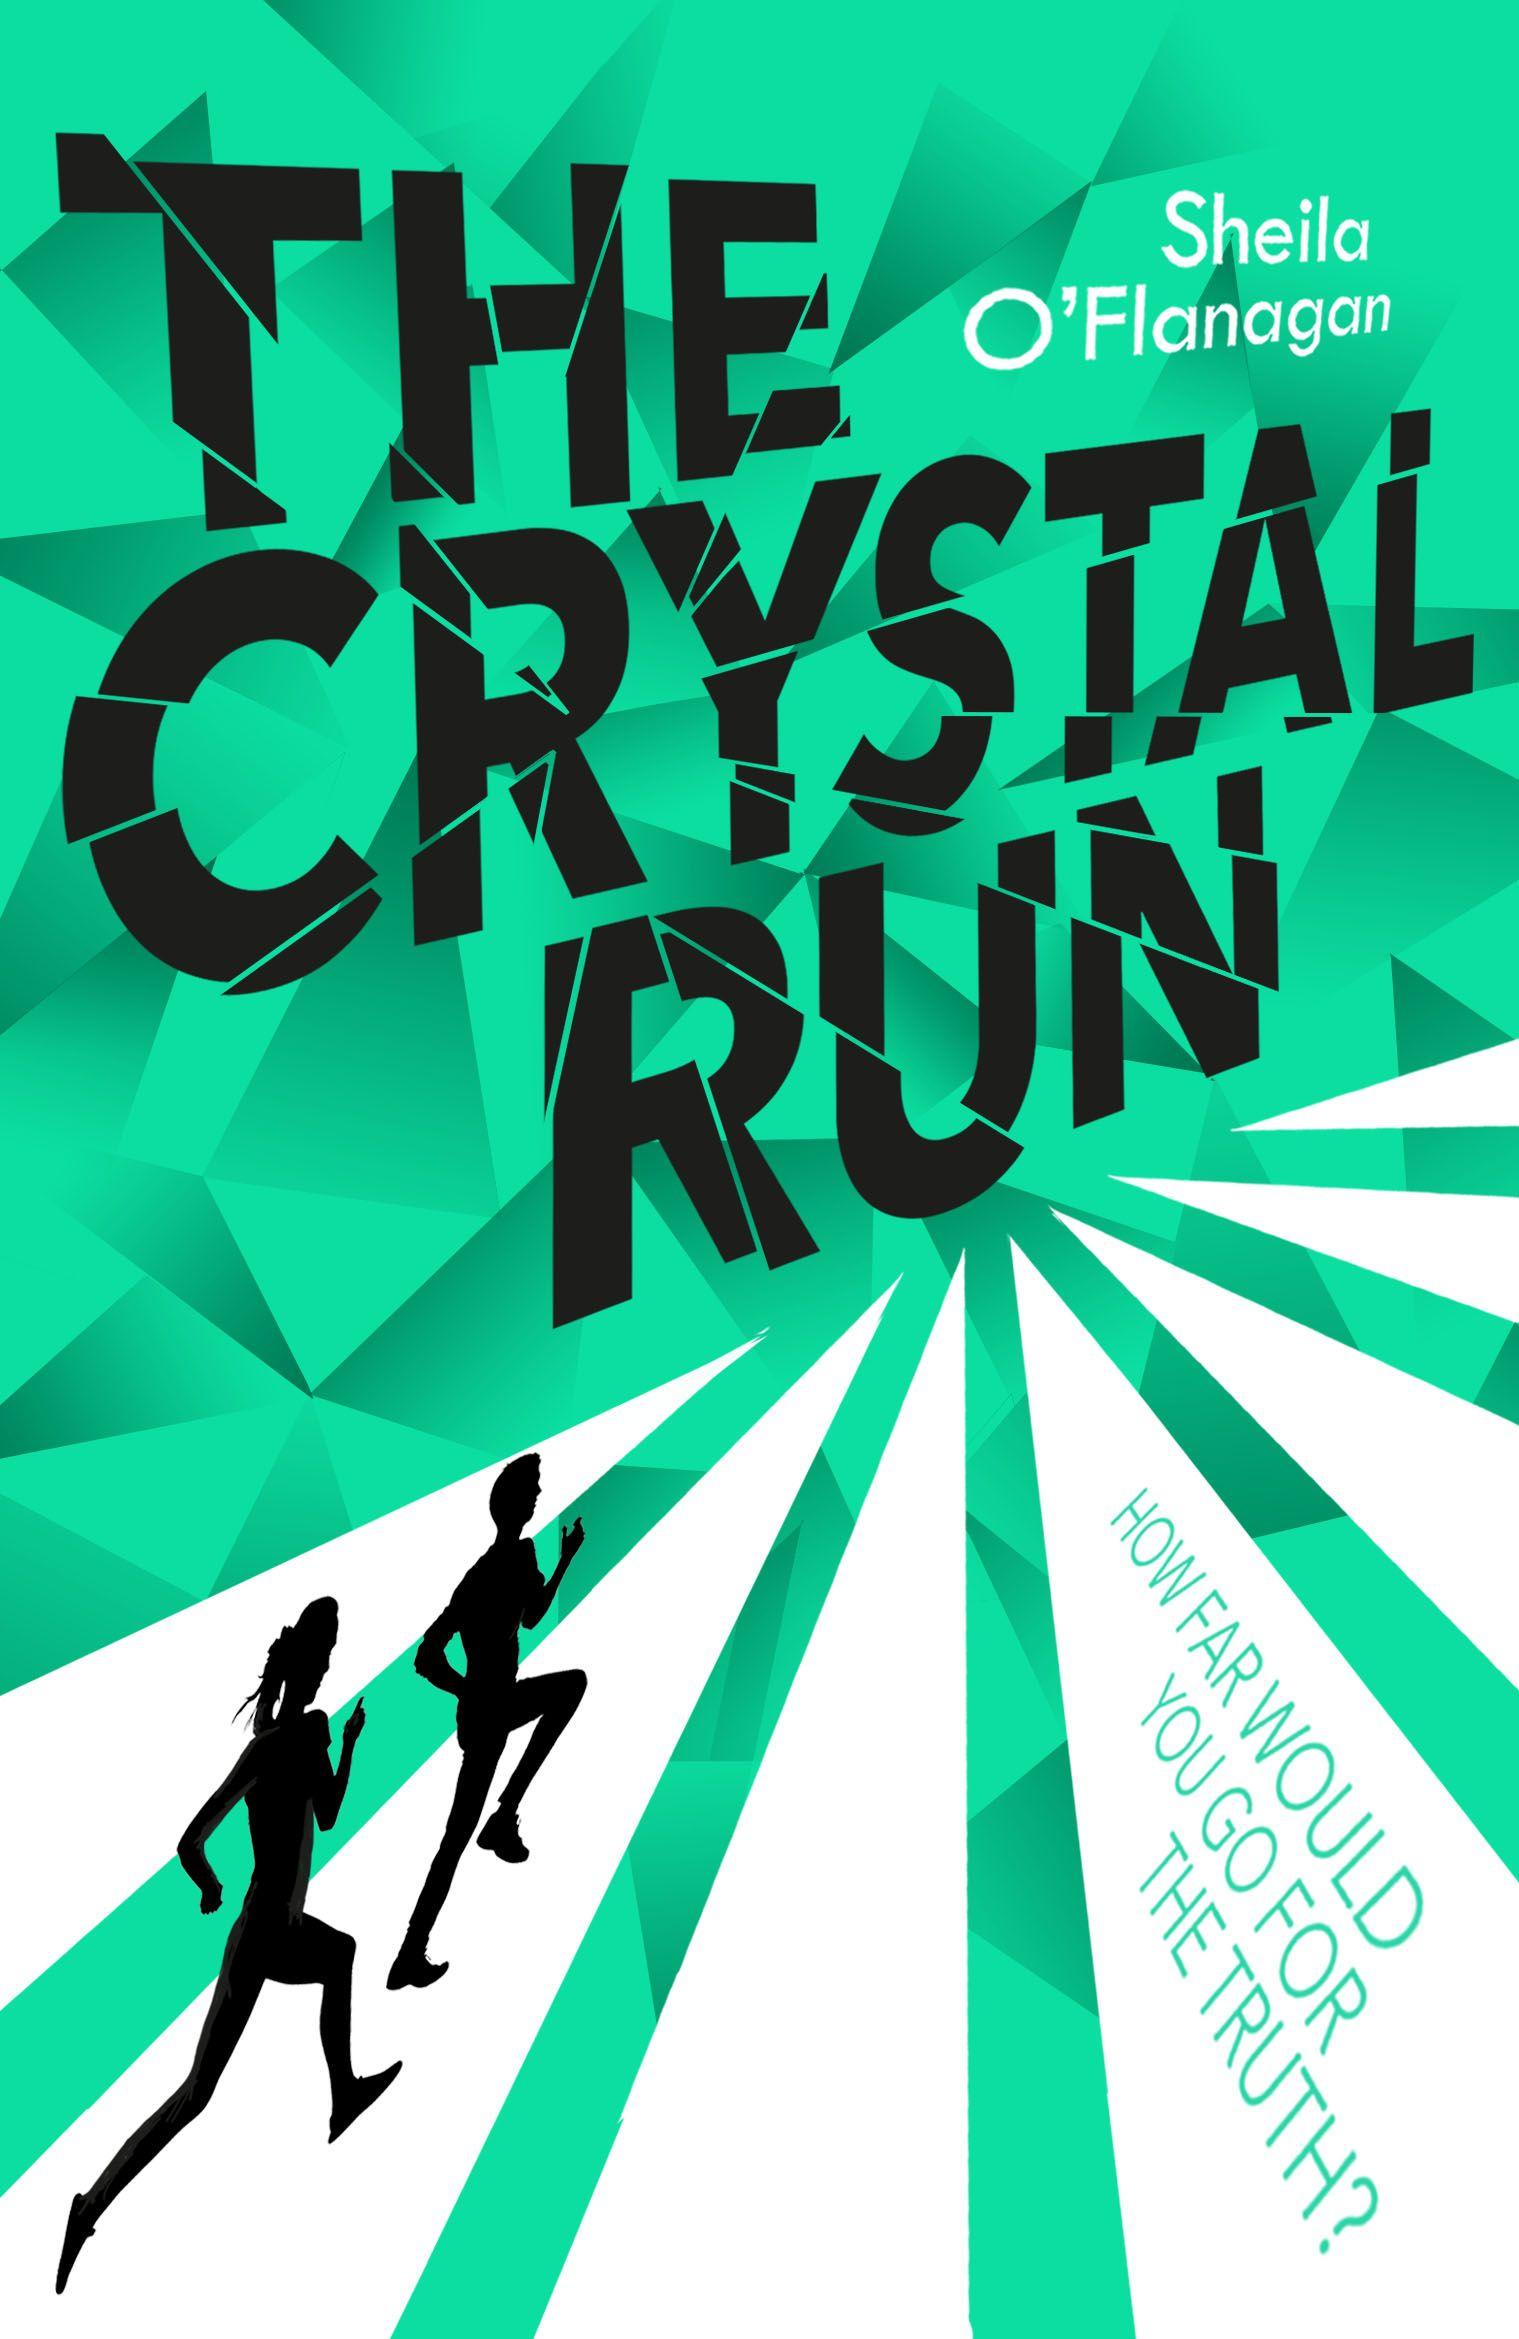 THE CRYSTAL RUN by Sheila O'Flanagan; Hodder Children's